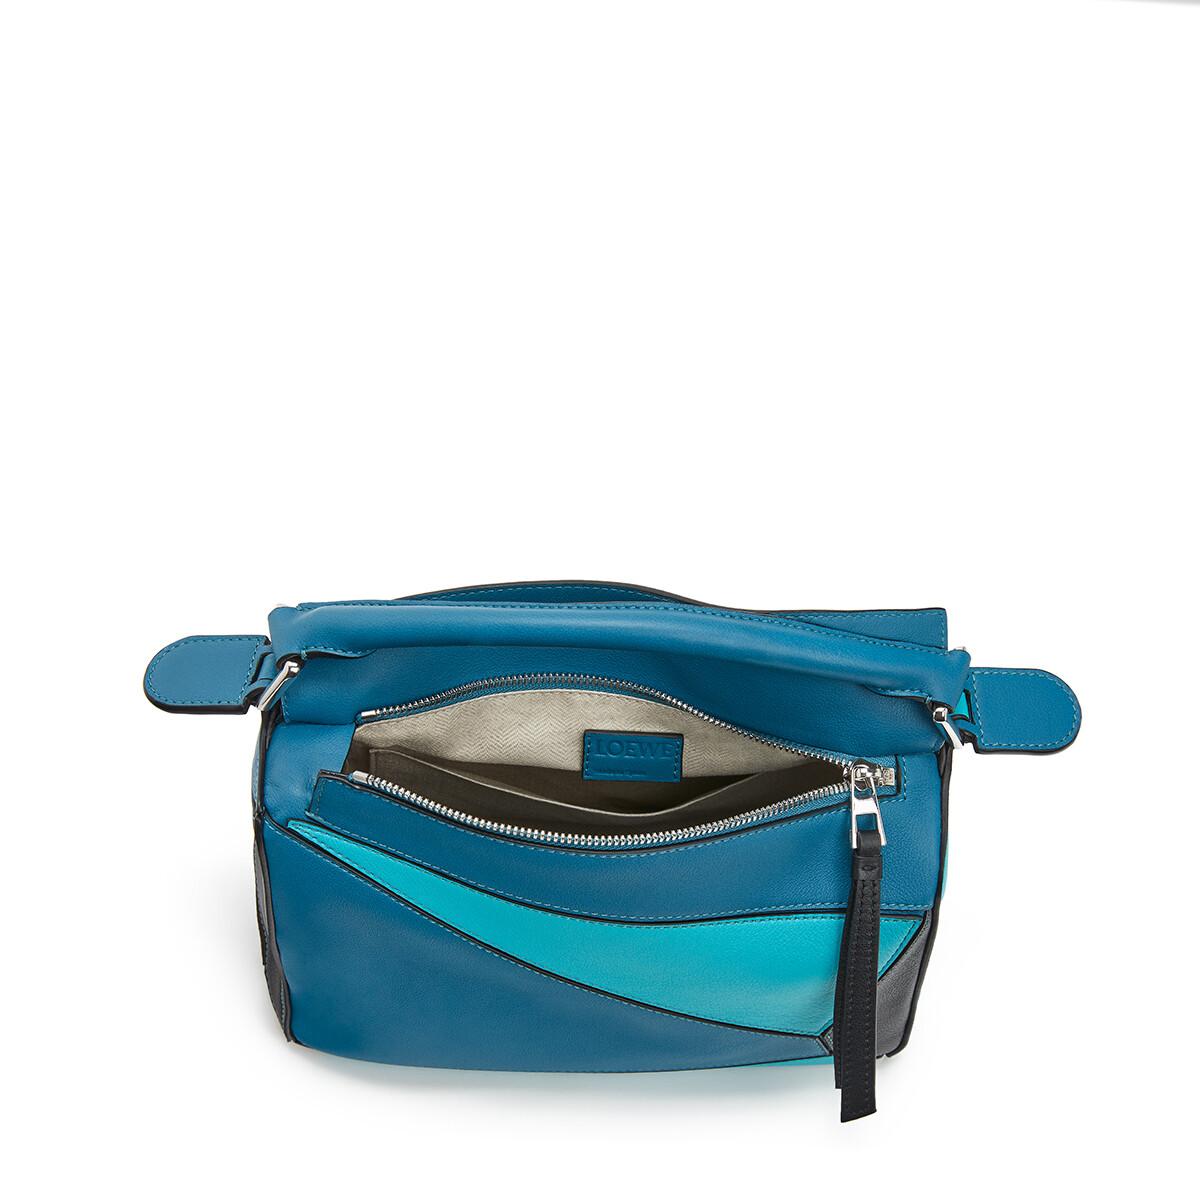 LOEWE Puzzle Small Bag Dark Lagoon/Black front